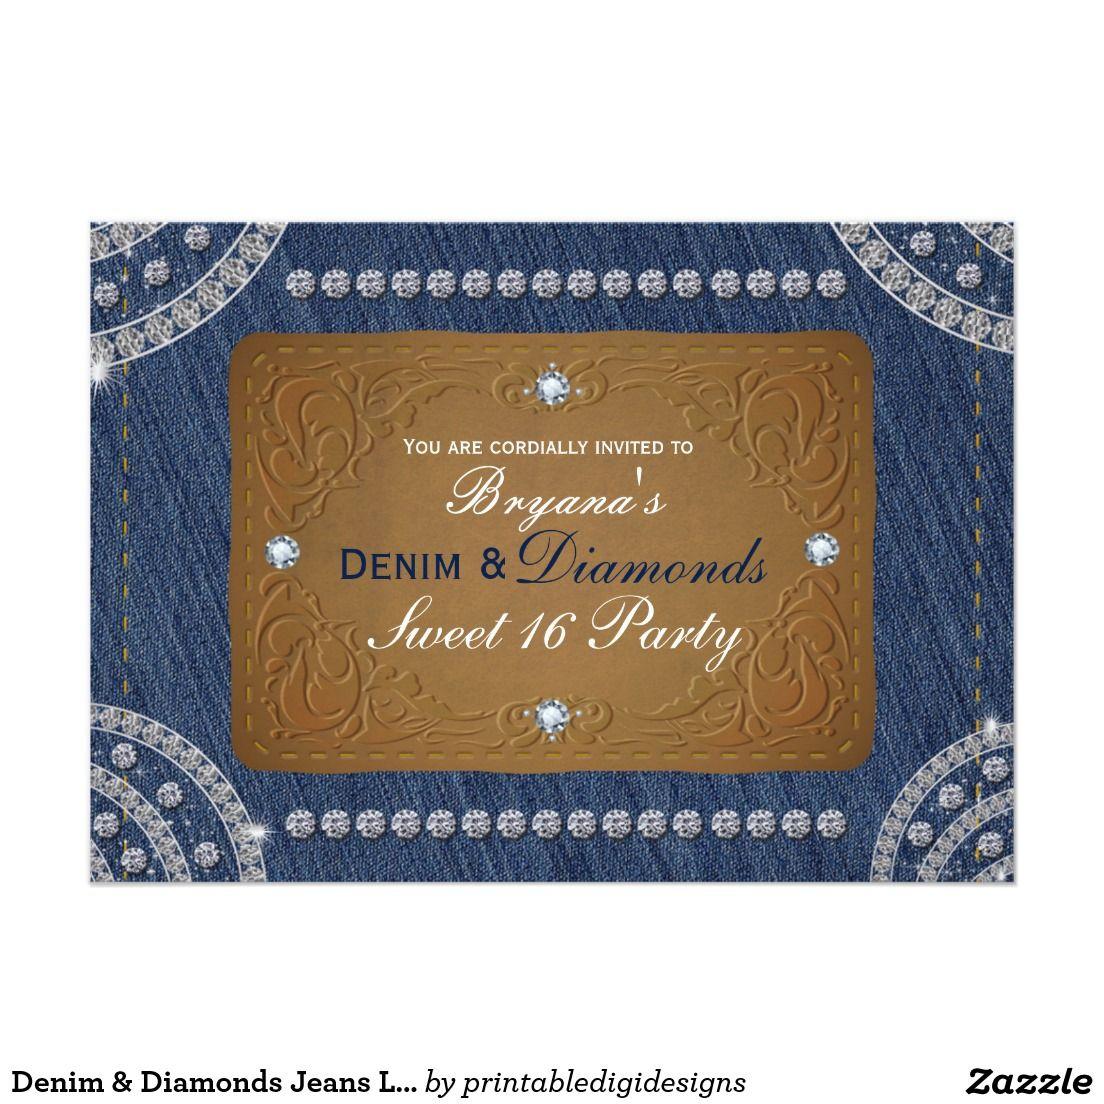 Diamond Wedding Invitation Label: Denim & Diamonds Jeans Label Party Invitations